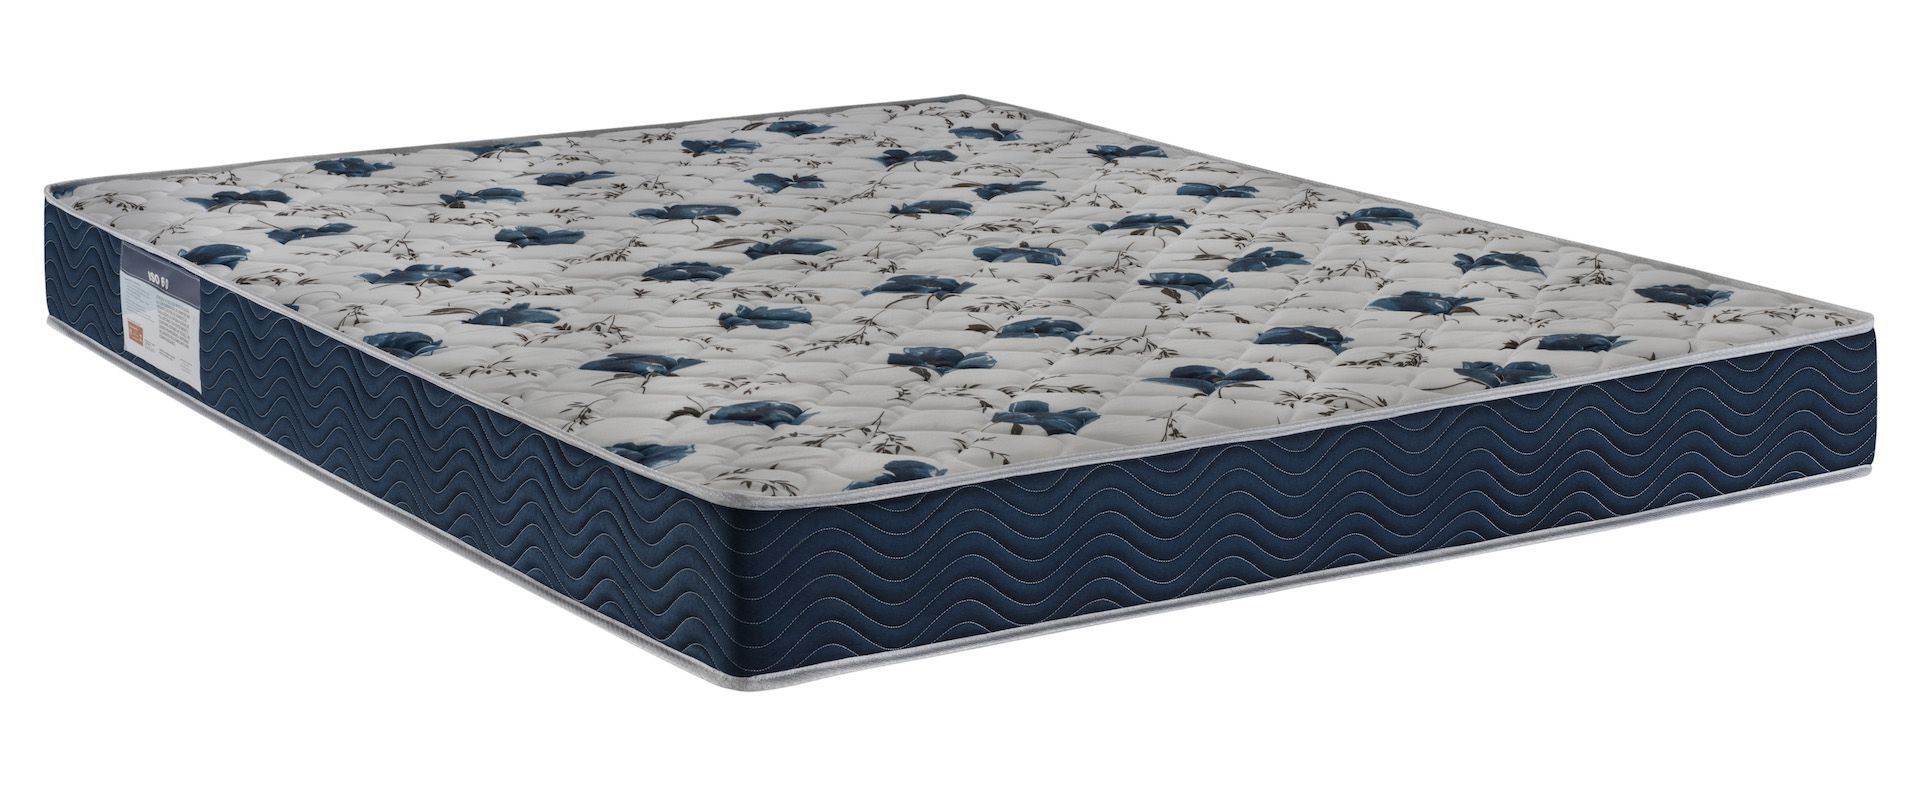 CAMA BOX UNIVERSAL CORINO + COLCHÃO ORTOBOM ISO 6.0 D28 CASAL (138x188x18cm)